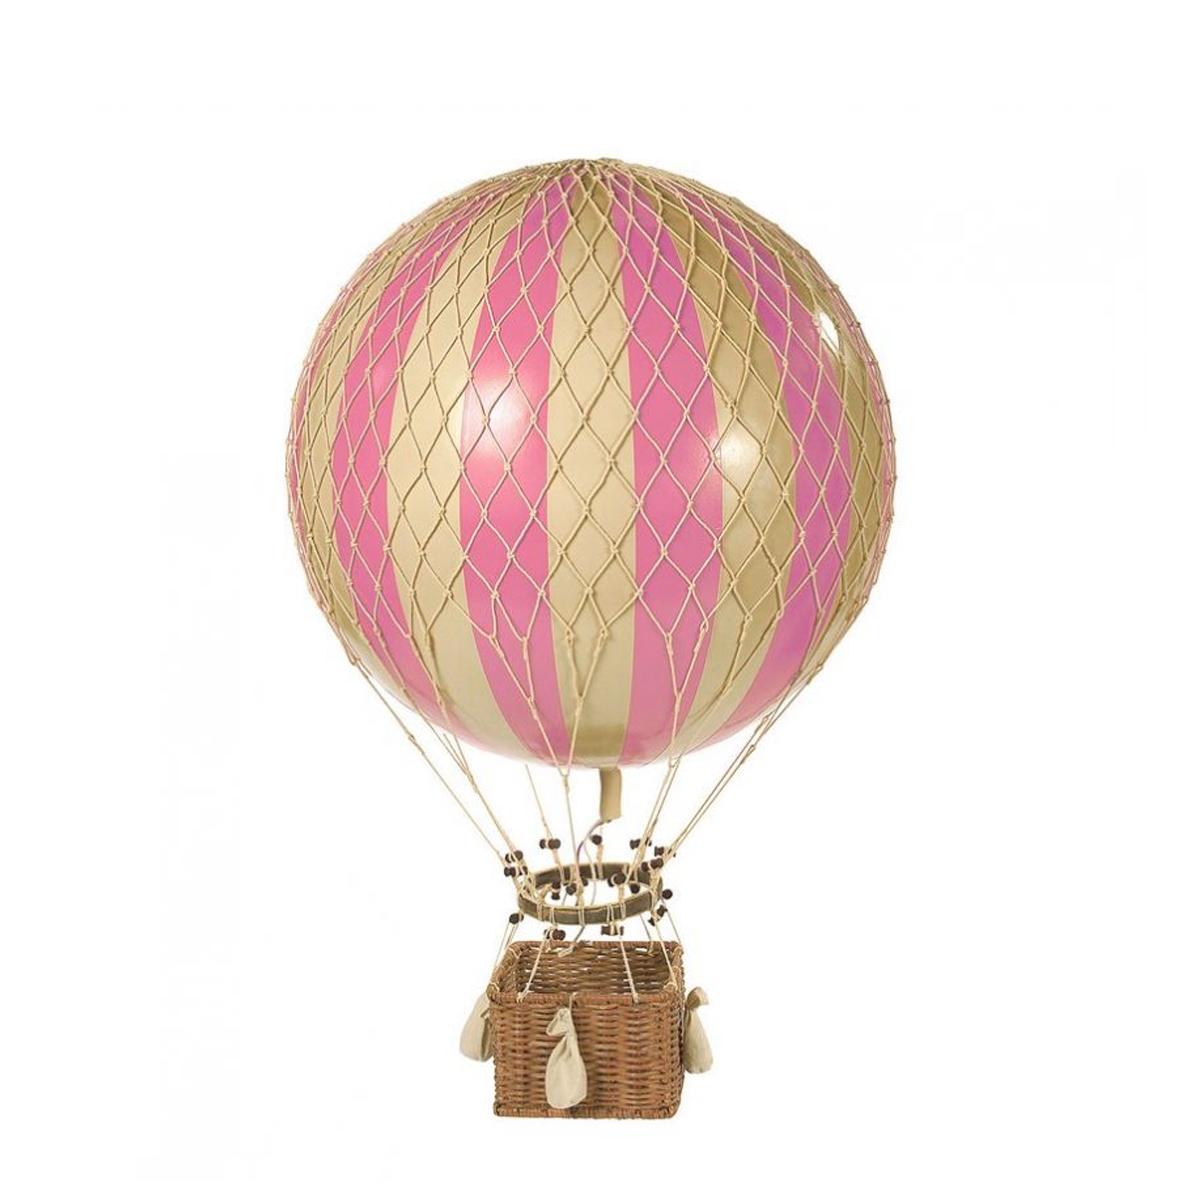 Image of Authentic Models luftballon 18 cm - rosa